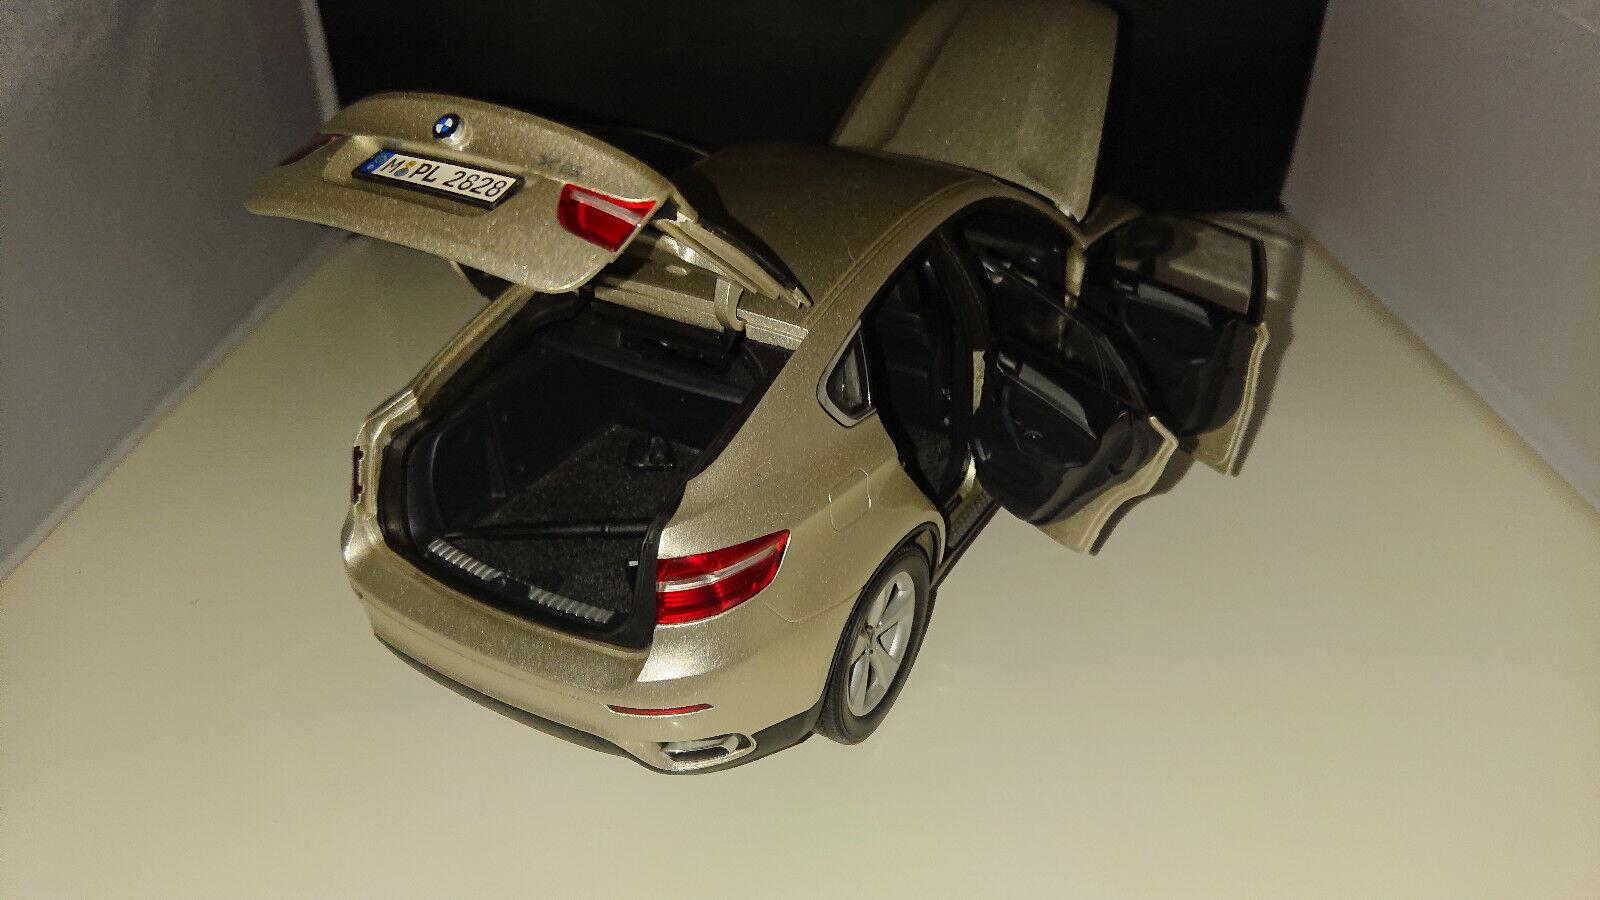 1 18 KYOSHO BMW x6 5,0 v8 argentoO e71 minerale argentoO v8 METALLIZZATO ac6b12